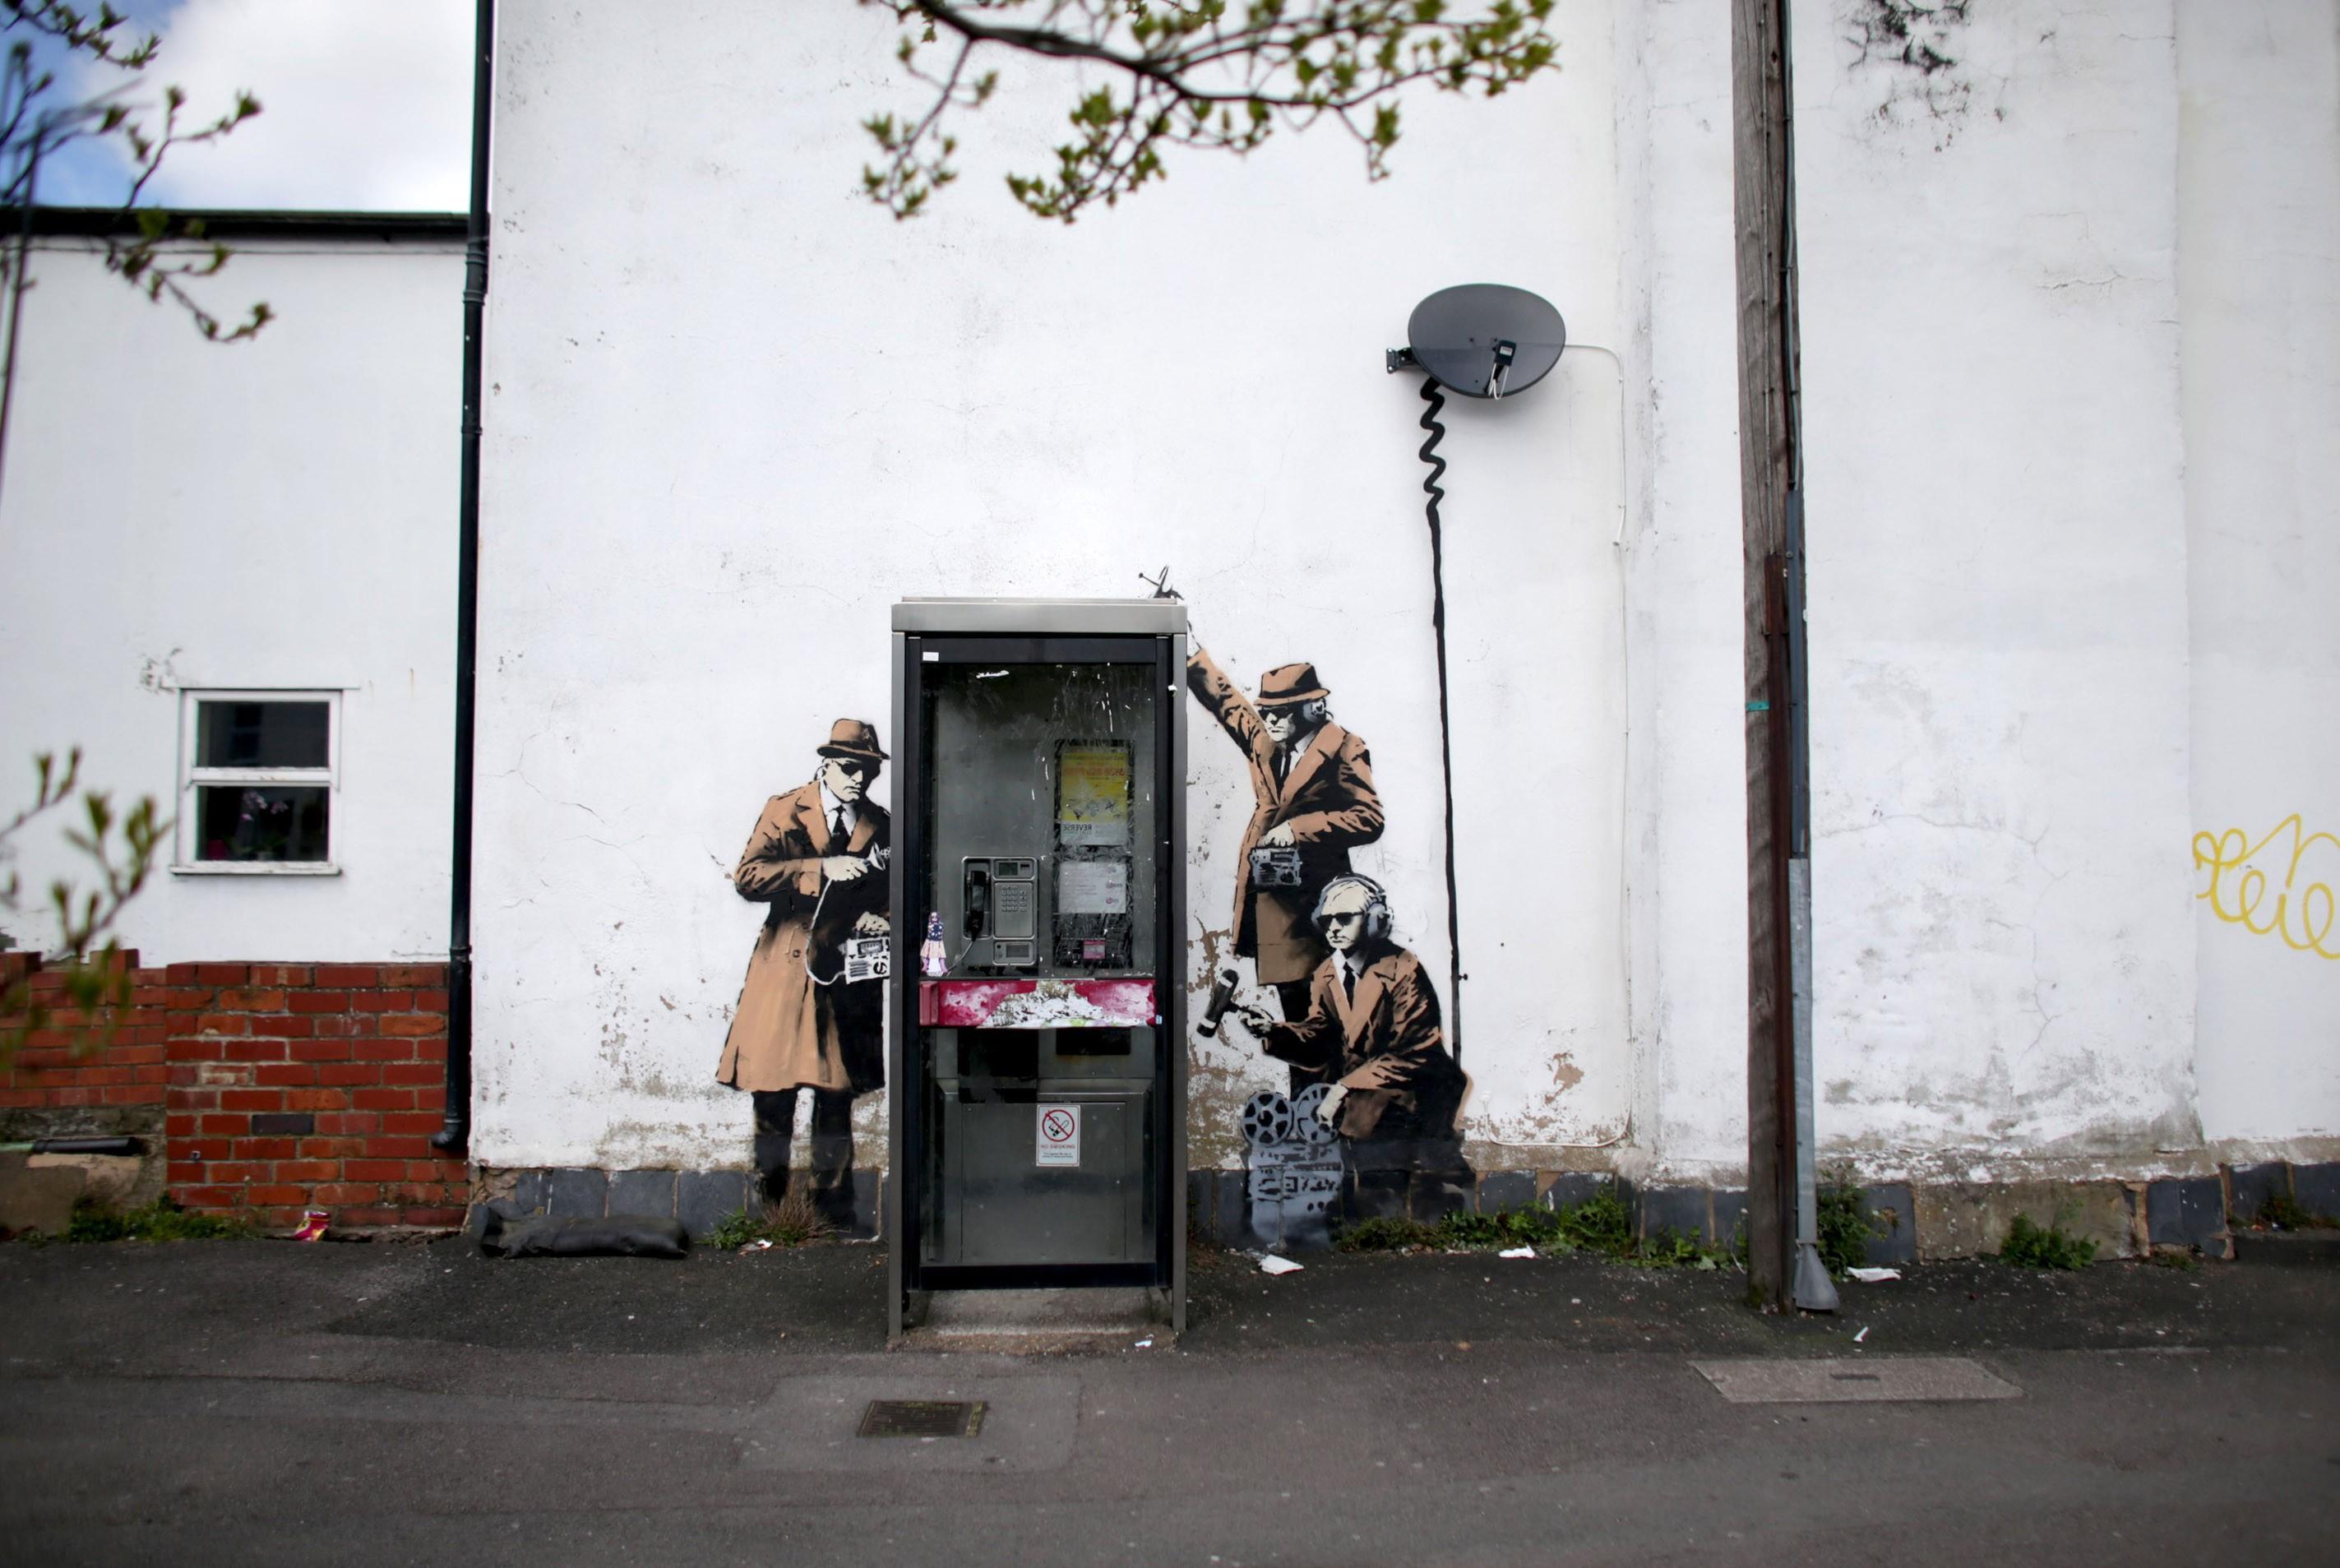 Graffitti de Banksy em Gloucestershire, Inglaterra, registrado em 2014. (Foto: Getty Images/ Matt Cardy)